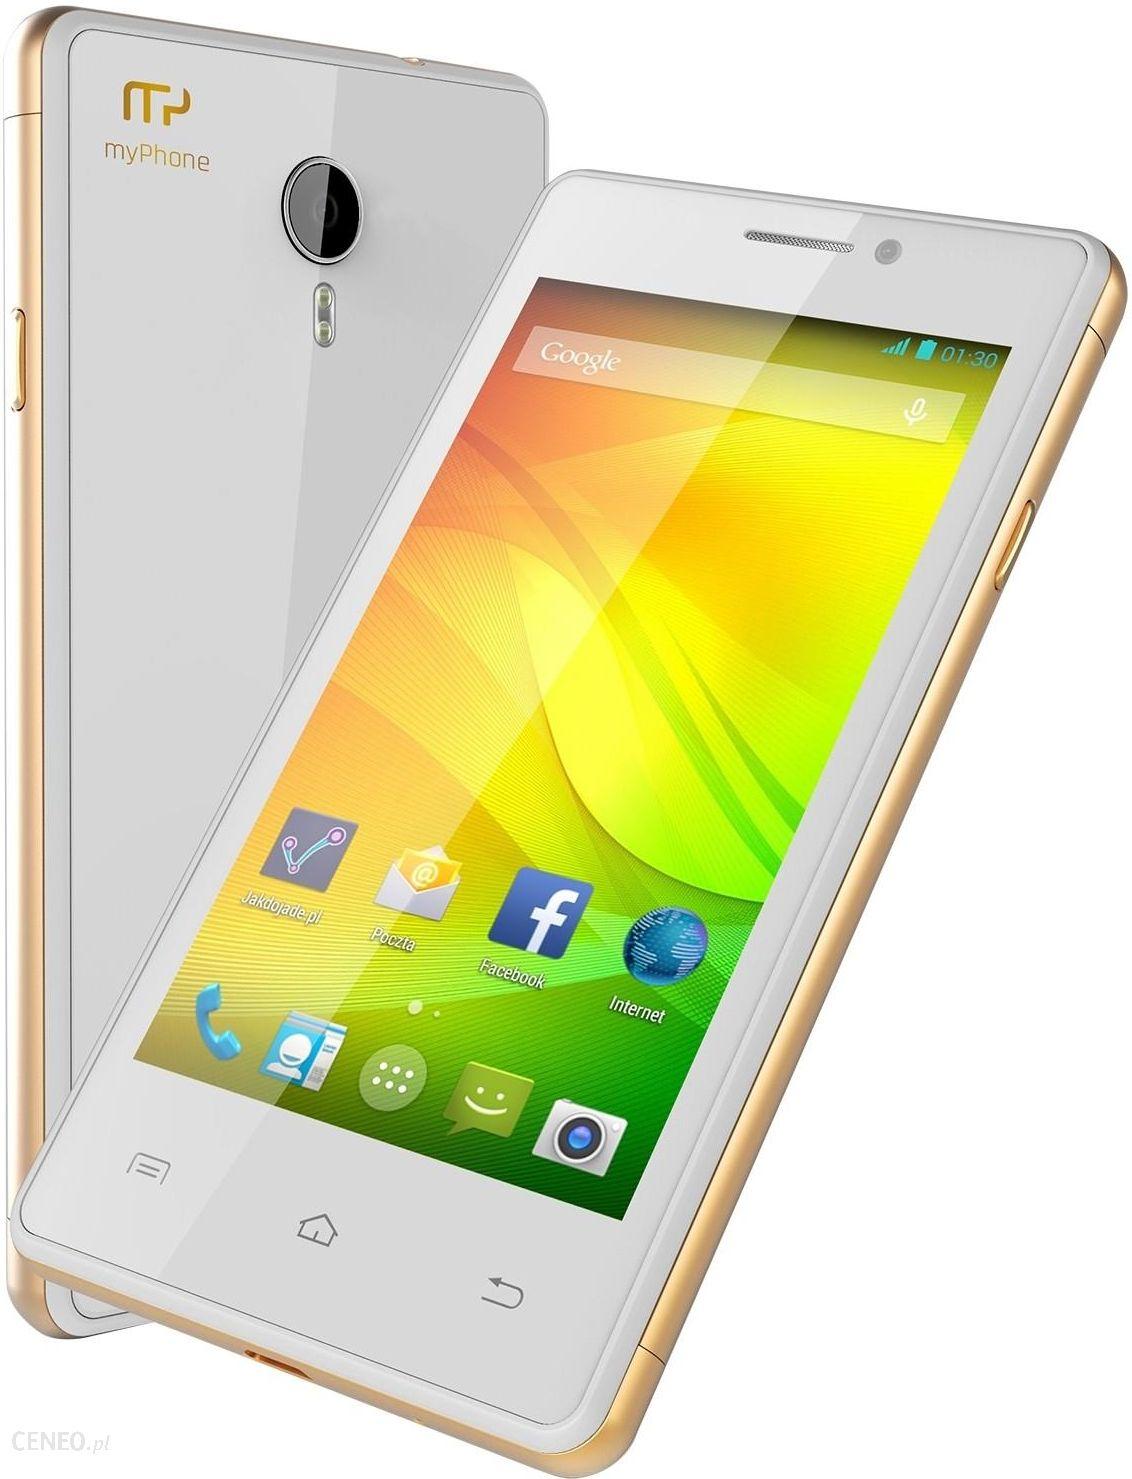 Myphone Compact Dual Sim Bialy Cena Opinie Na Ceneo Pl